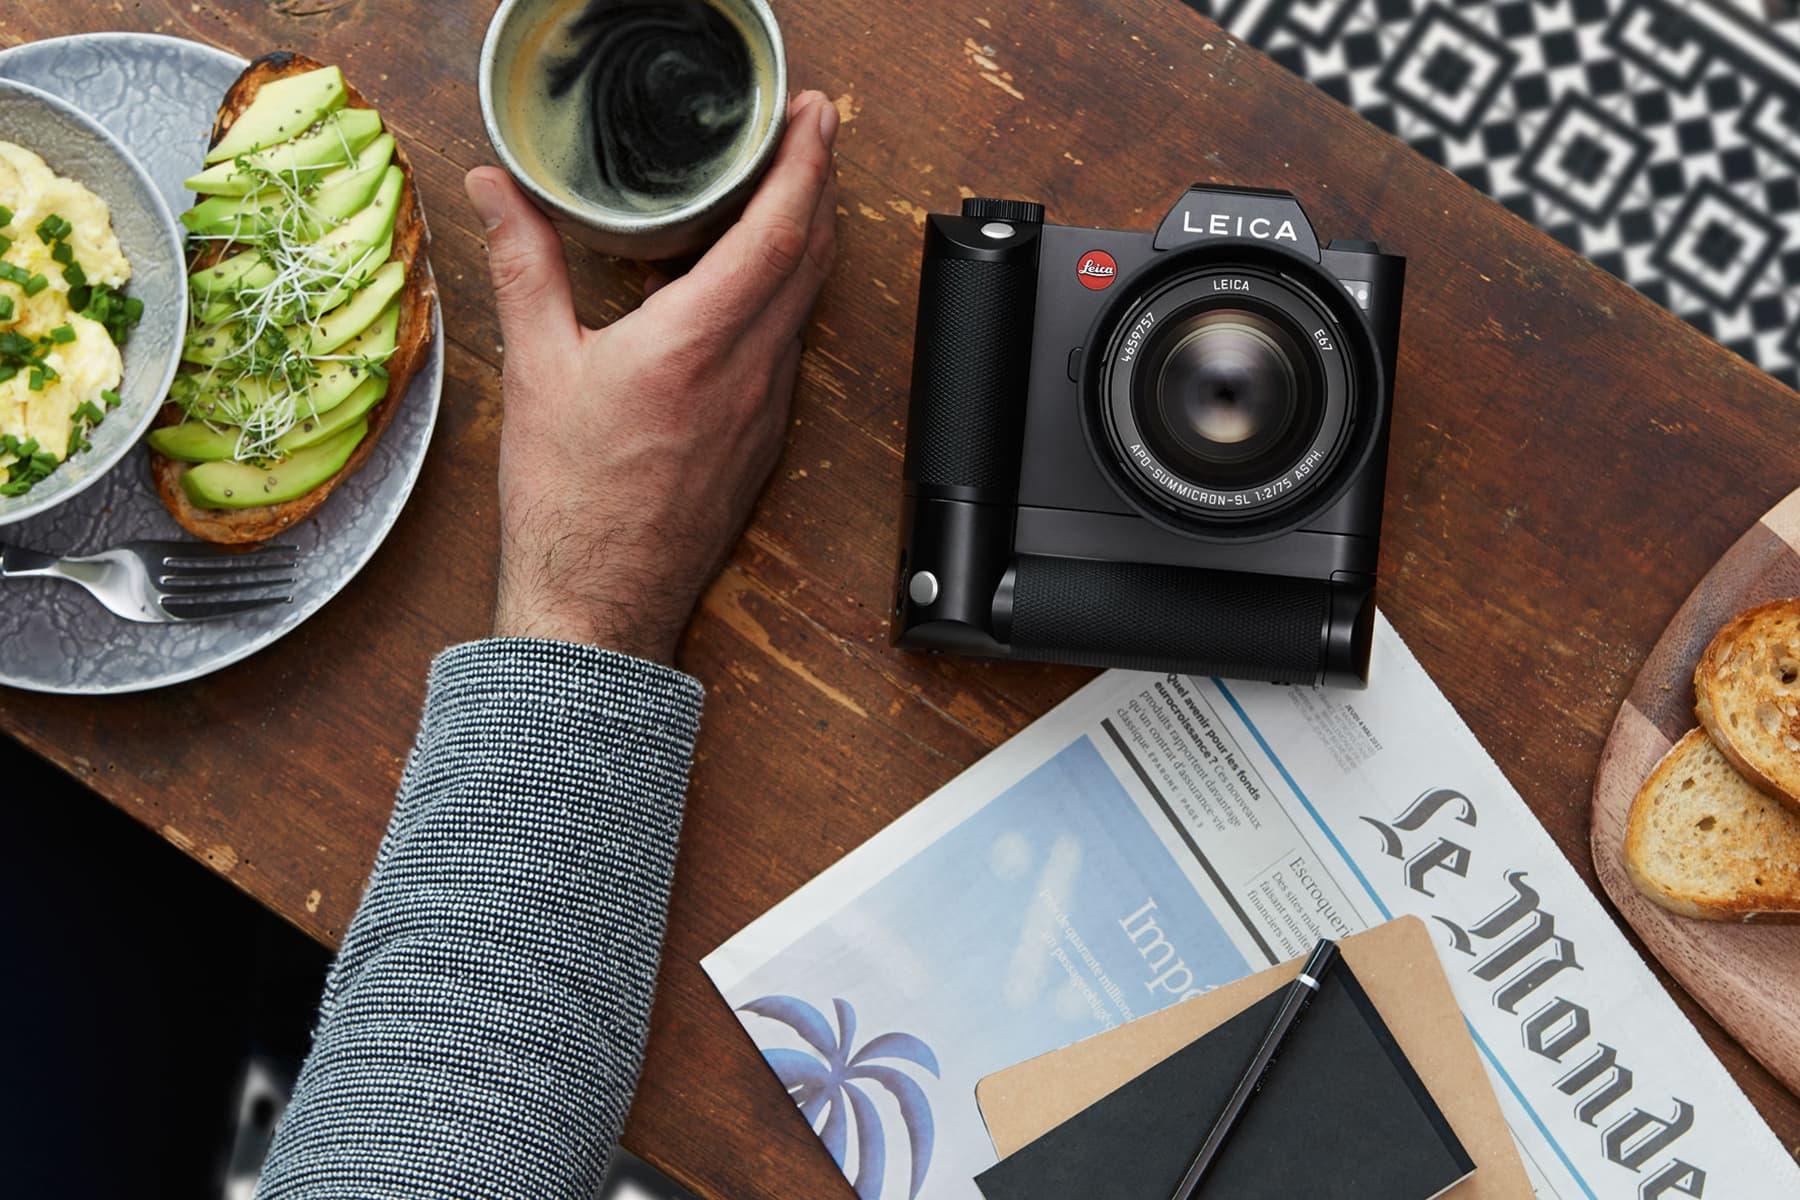 Leica 發佈兩款 SL 系統全新定焦鏡頭